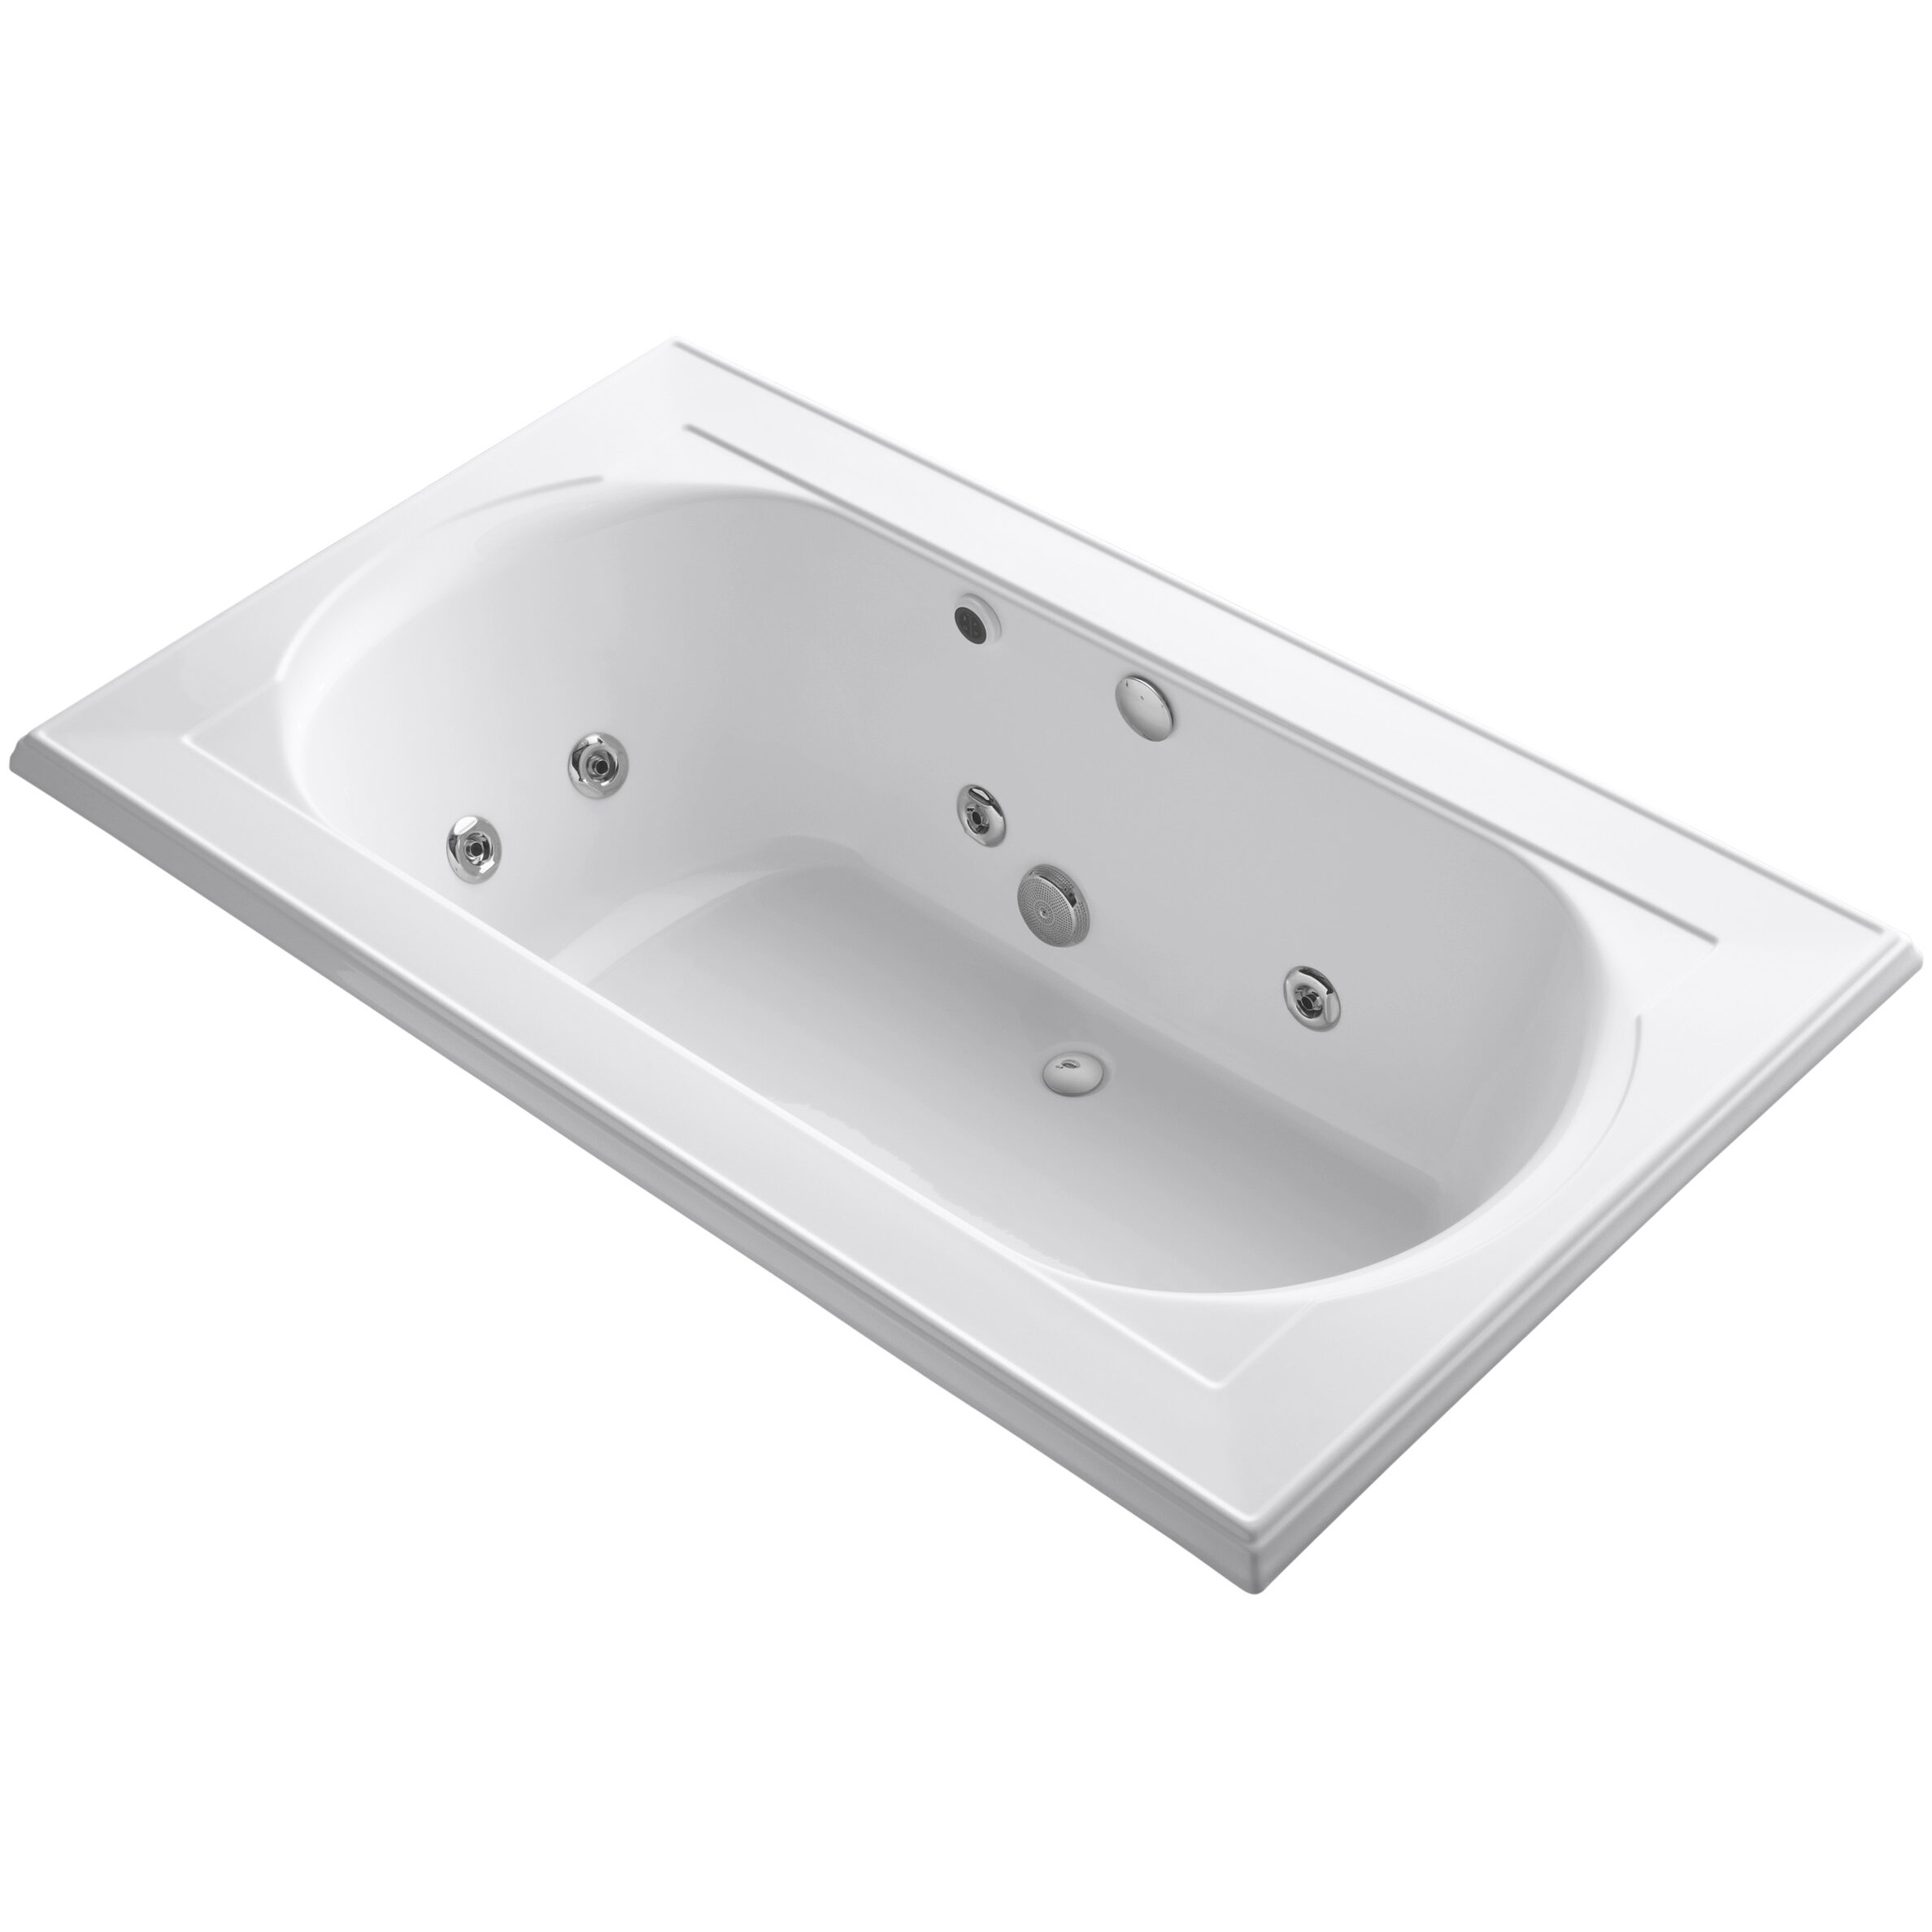 whirpool bathtub whirlpool badewanne test vergleich vieler wirlpools ios whirlpool tub right. Black Bedroom Furniture Sets. Home Design Ideas